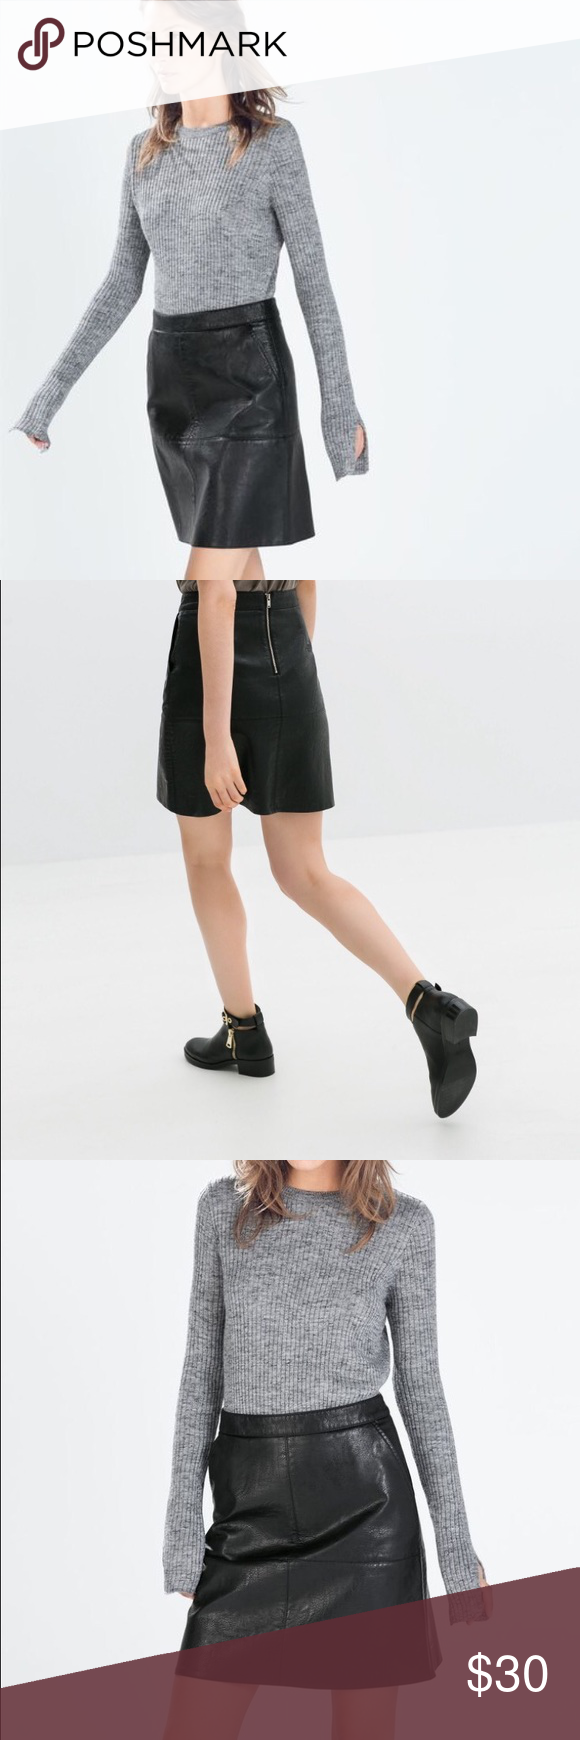 16d607042d Zara Faux Leather A Line Skirt